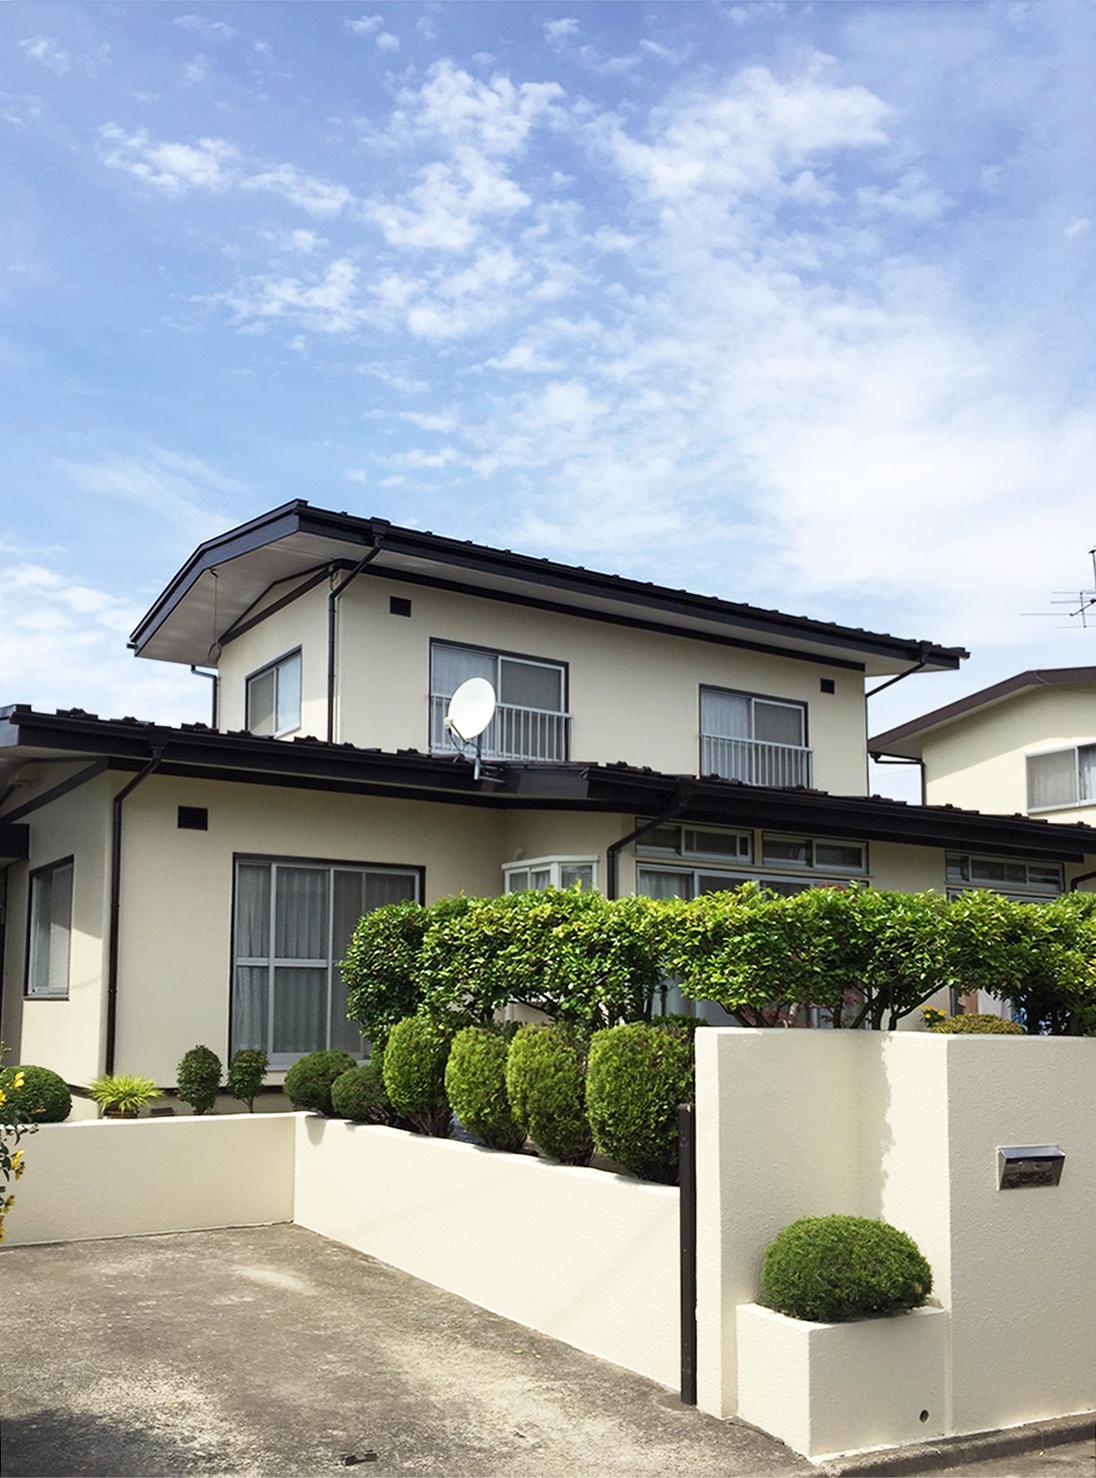 泉区S邸 外壁塗装・外装リフォーム 117万円/工期20日間 施工後